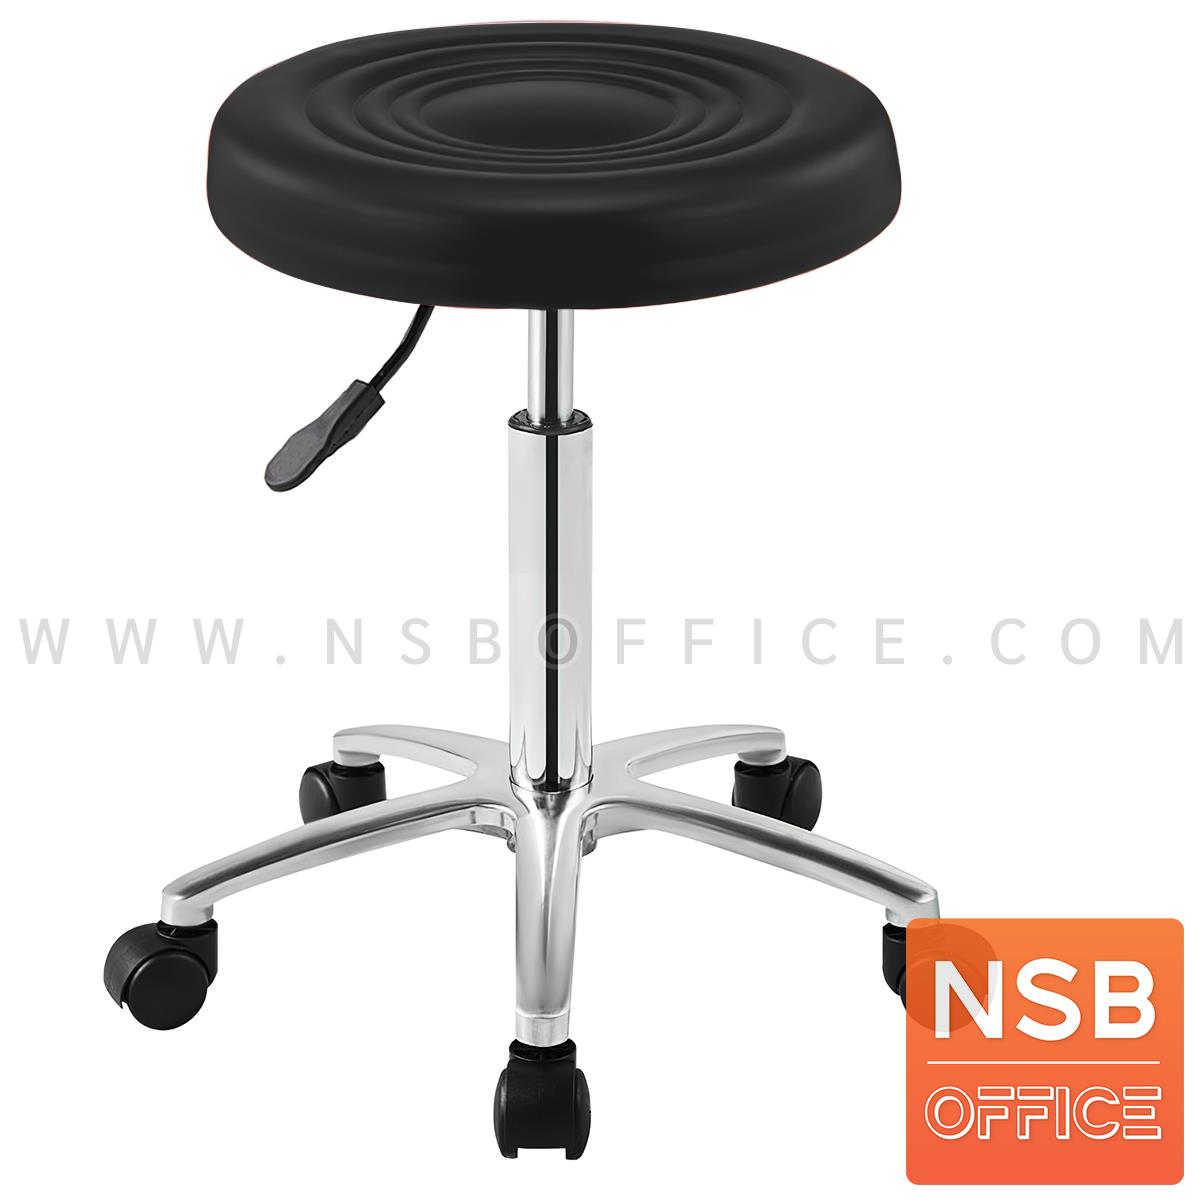 B09A182:เก้าอี้บาร์สตูลที่นั่งกลม สีดำ รุ่น Rivendell (ริเวนเดลล์)  ขาอลูมิเนียม 5 แฉก ล้อเลื่อน